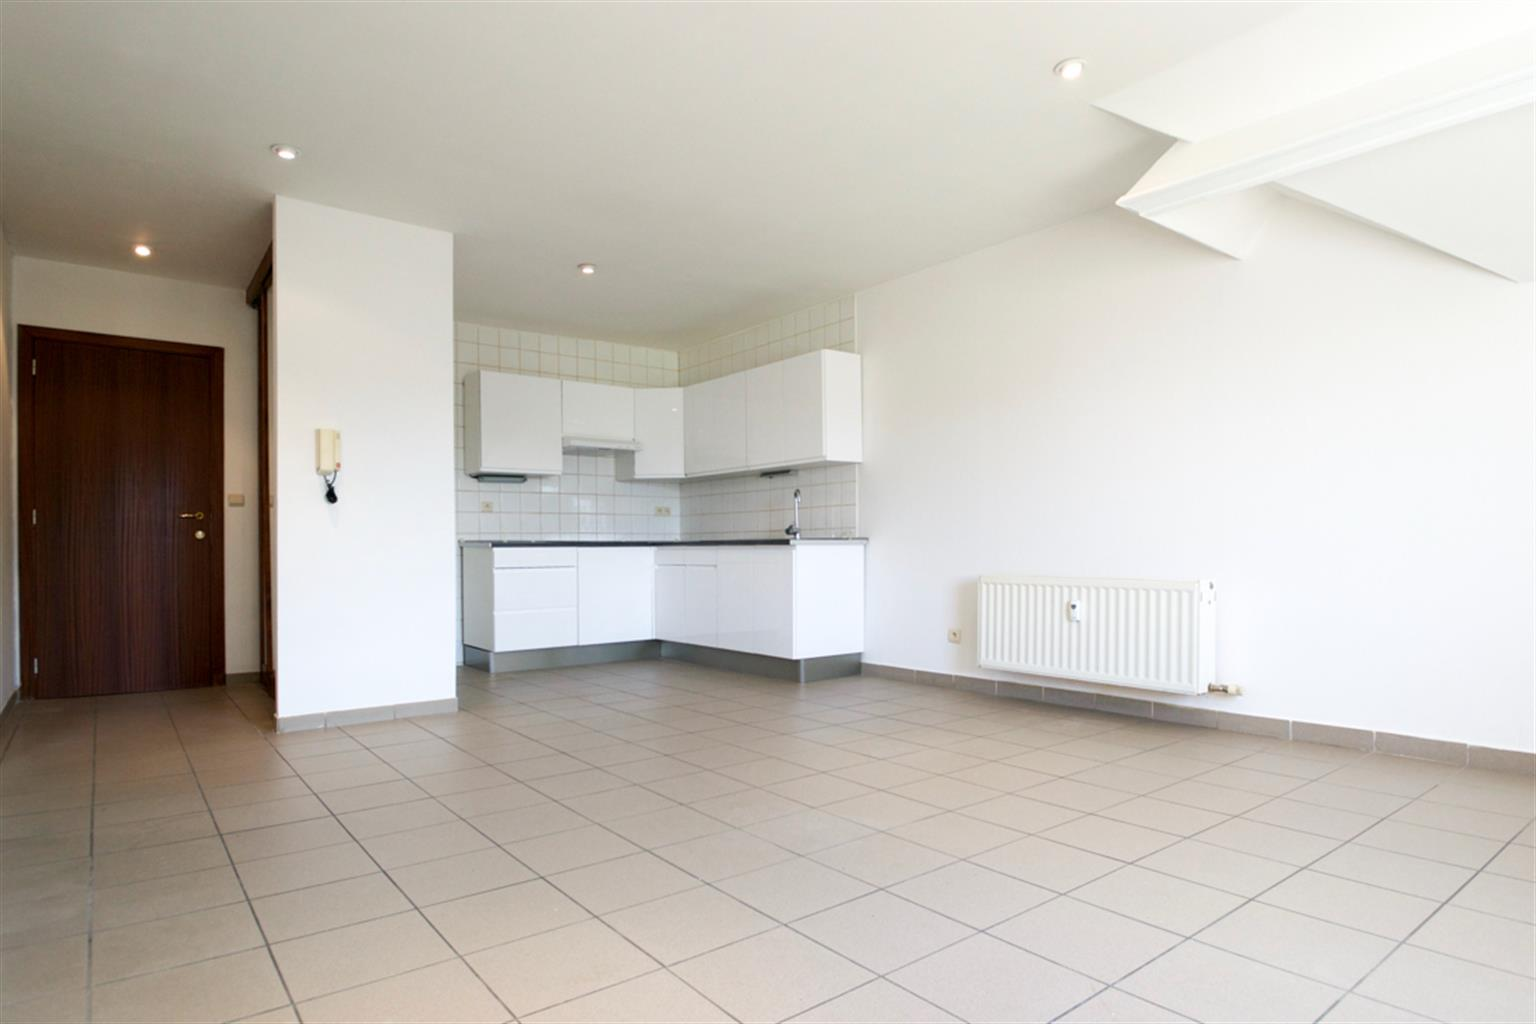 Appartement - Leval-Trahegnies - #3988340-0